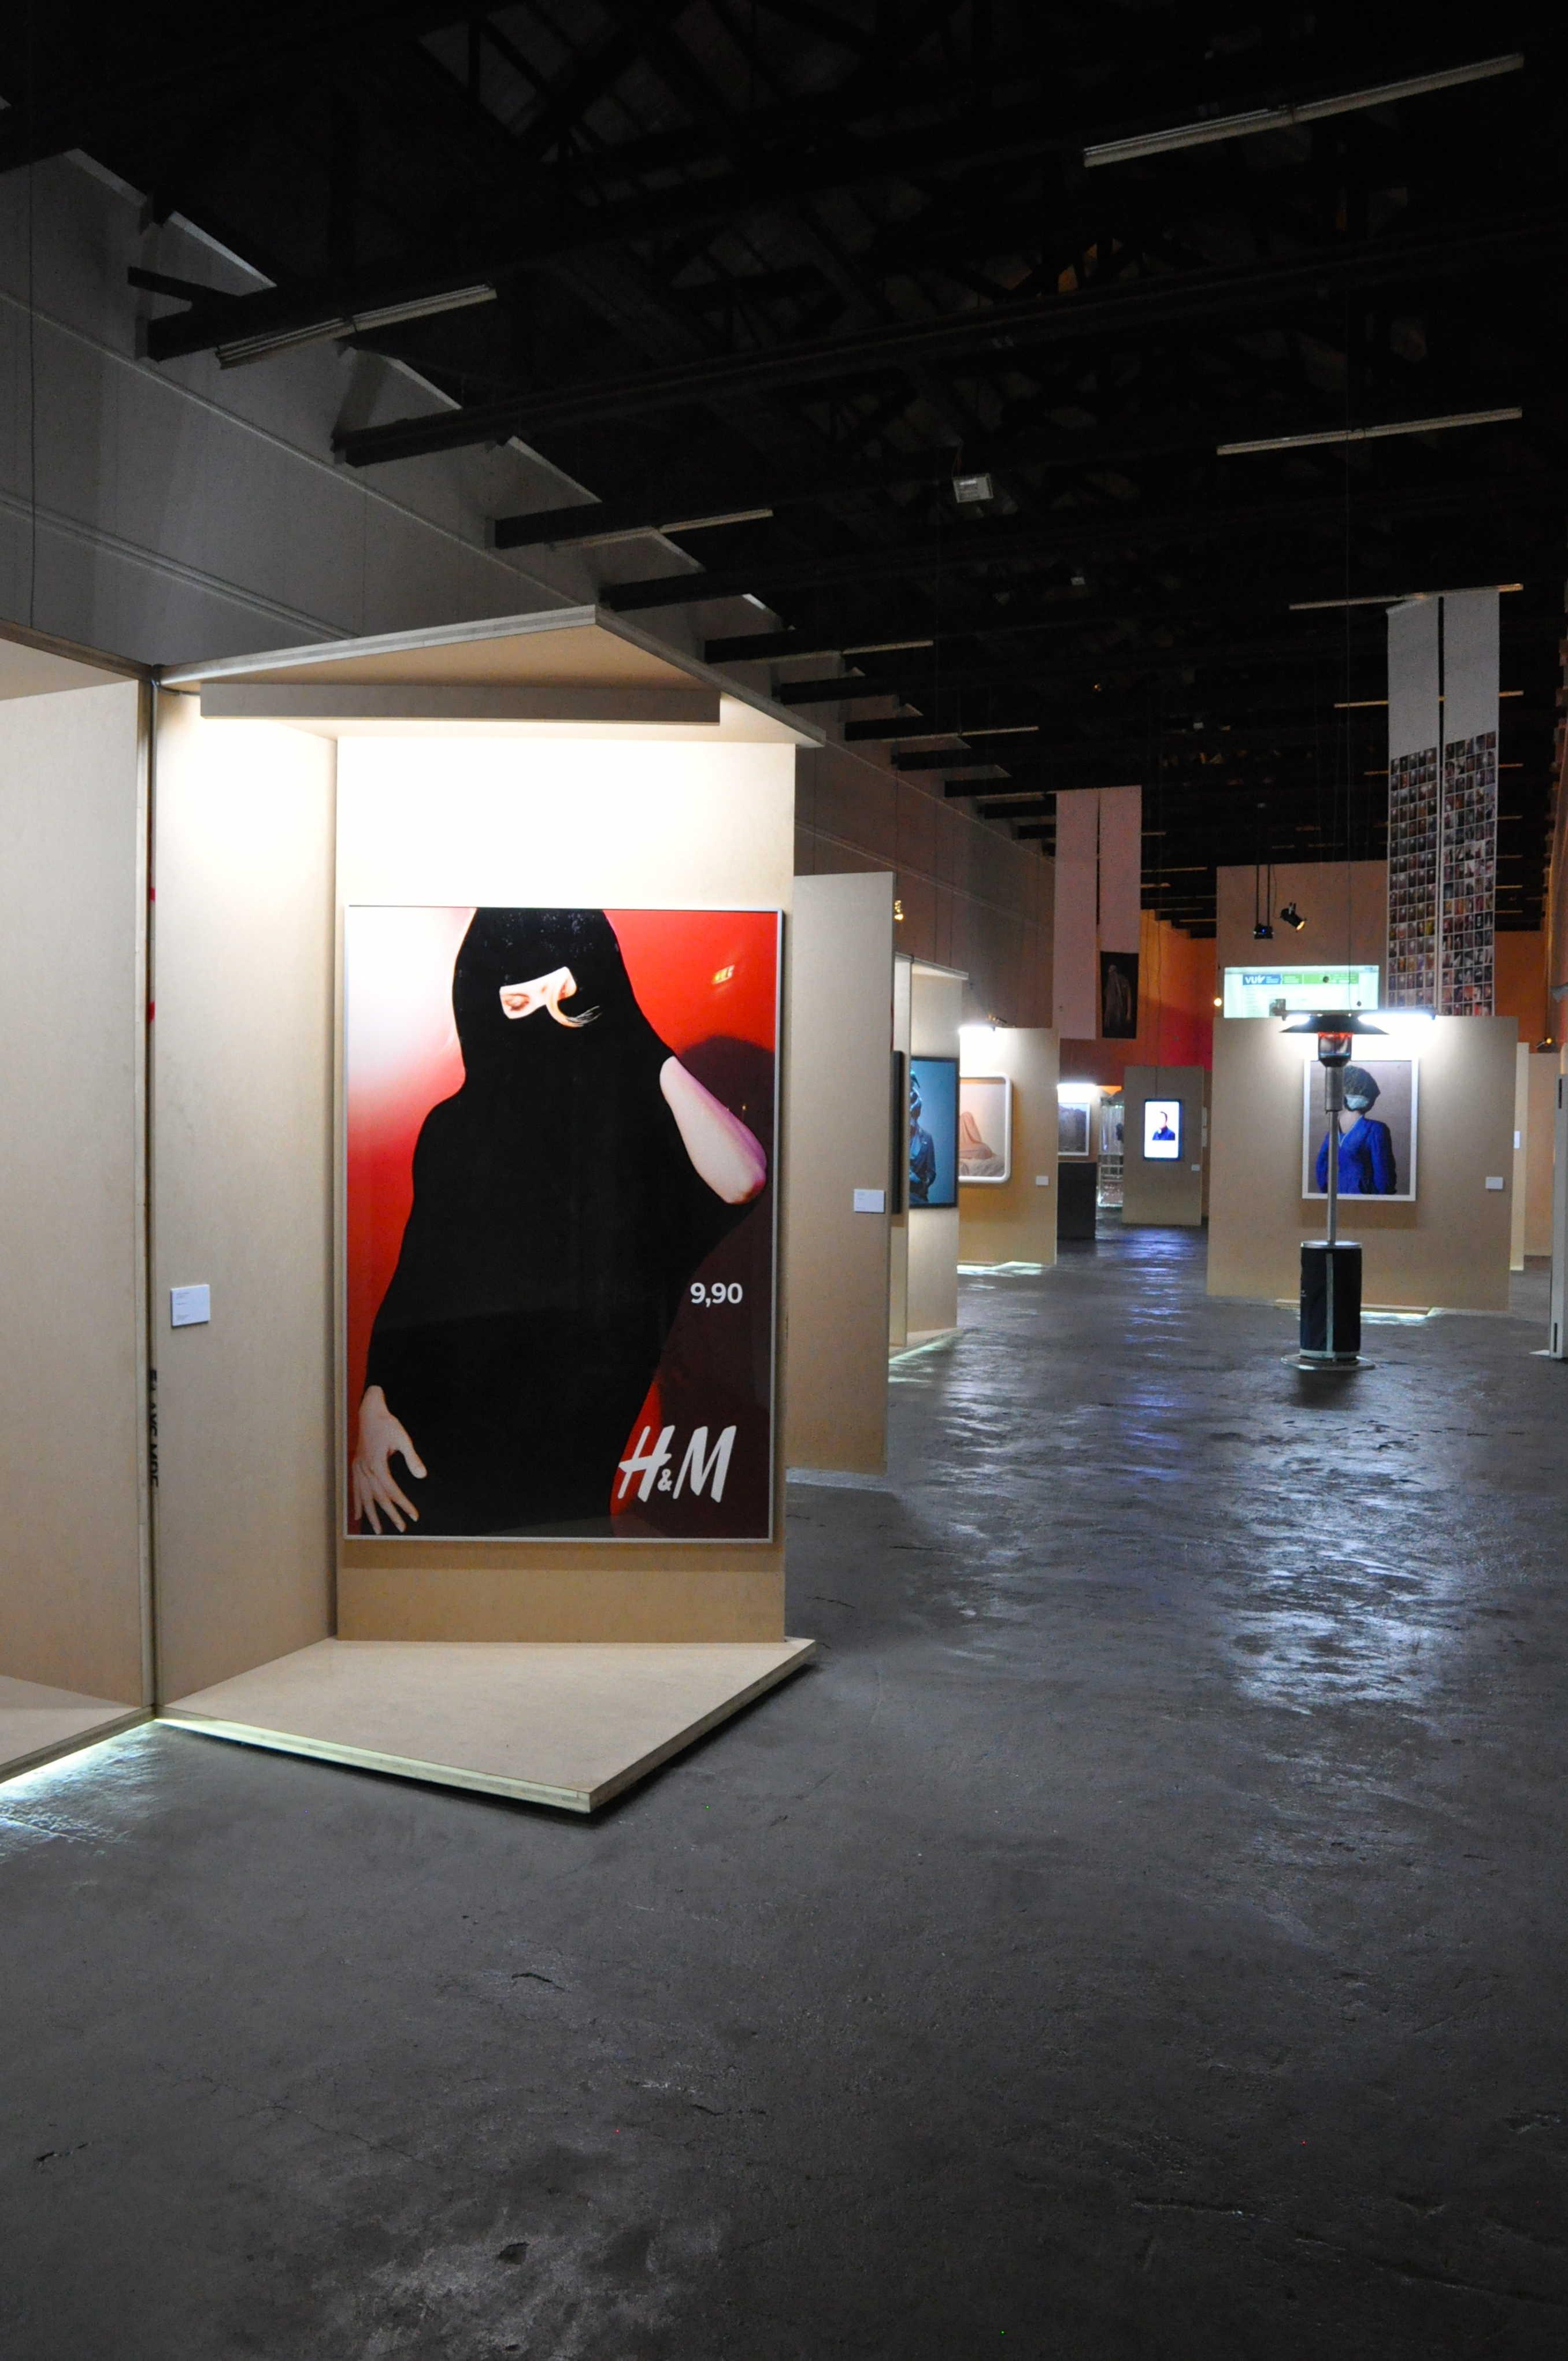 34c611aa0a Faceless - Faceless an exhibition on seduction